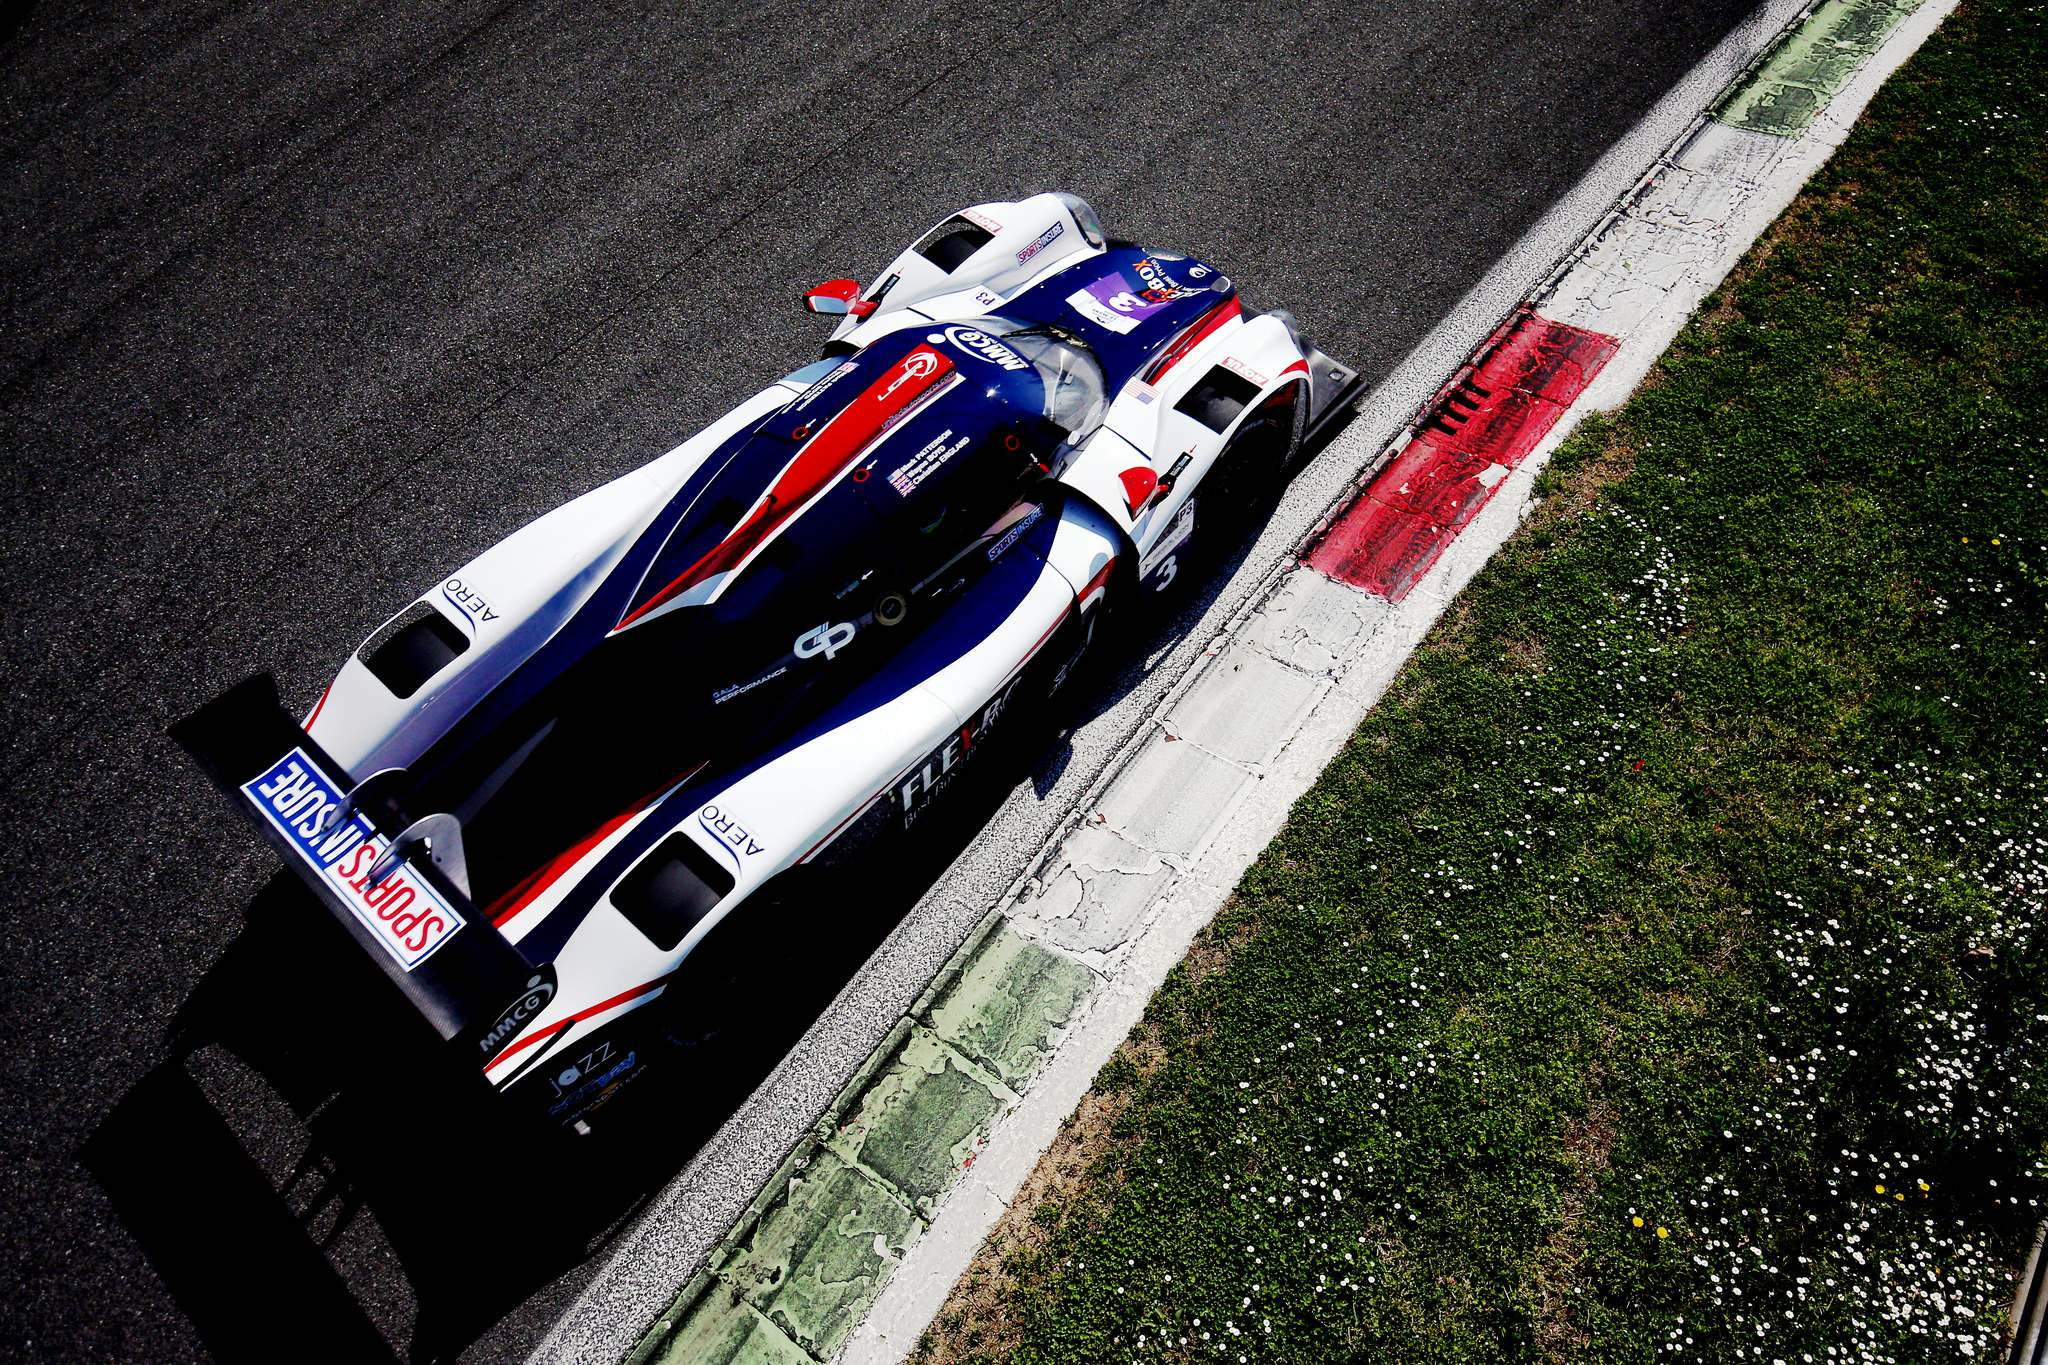 unitedautosports2 United Autosports in Monza